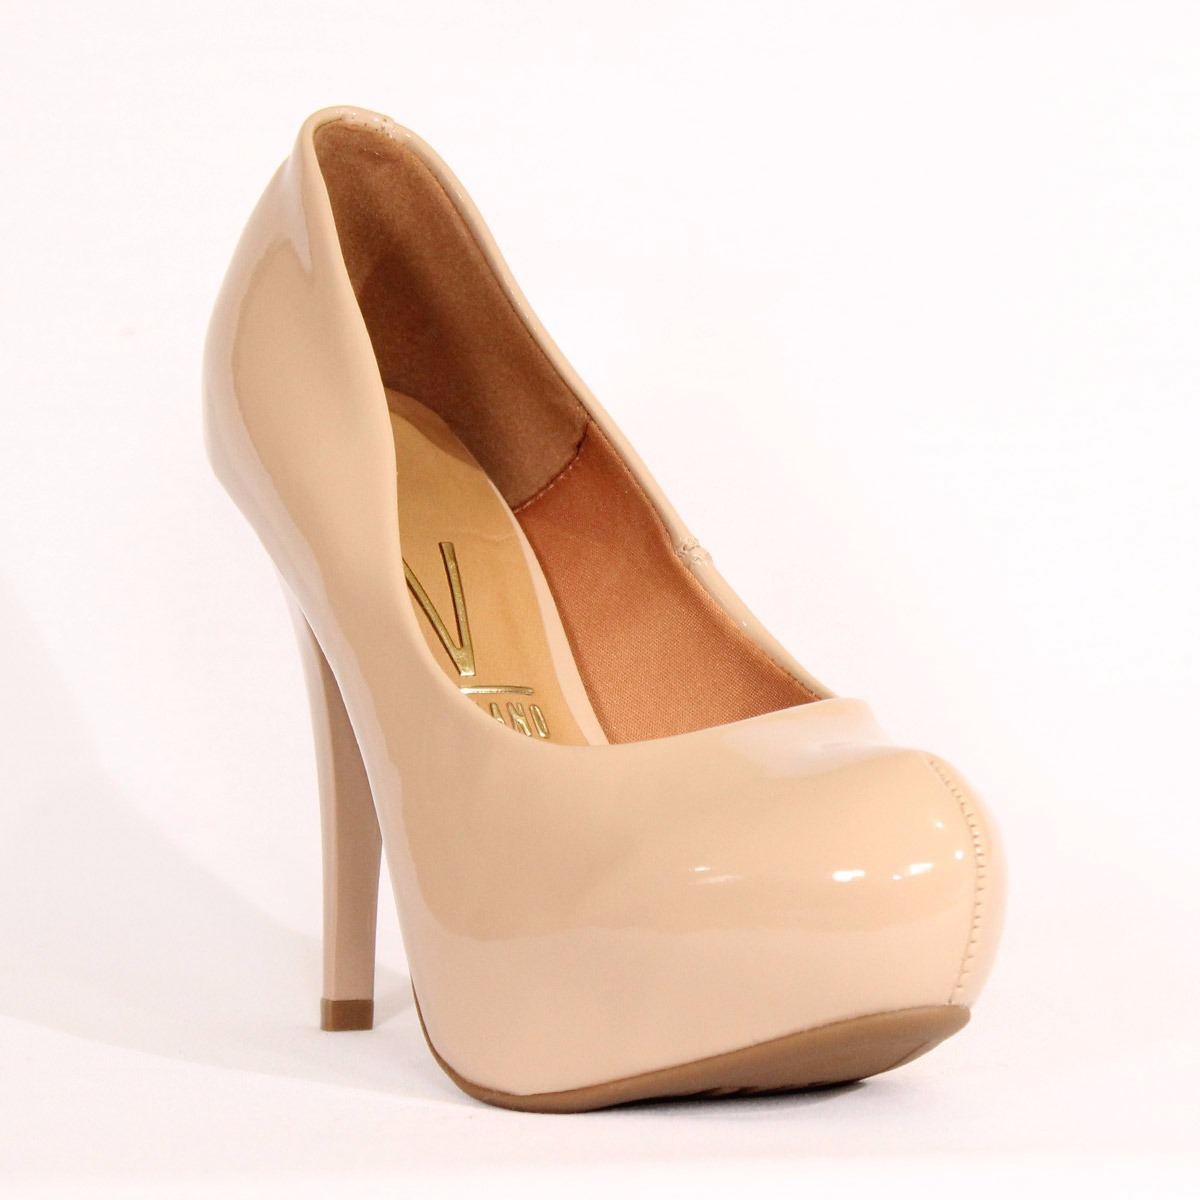 b12c6c3aab sapato scarpin salto agulha meia pata nude - vizzano. Carregando zoom.